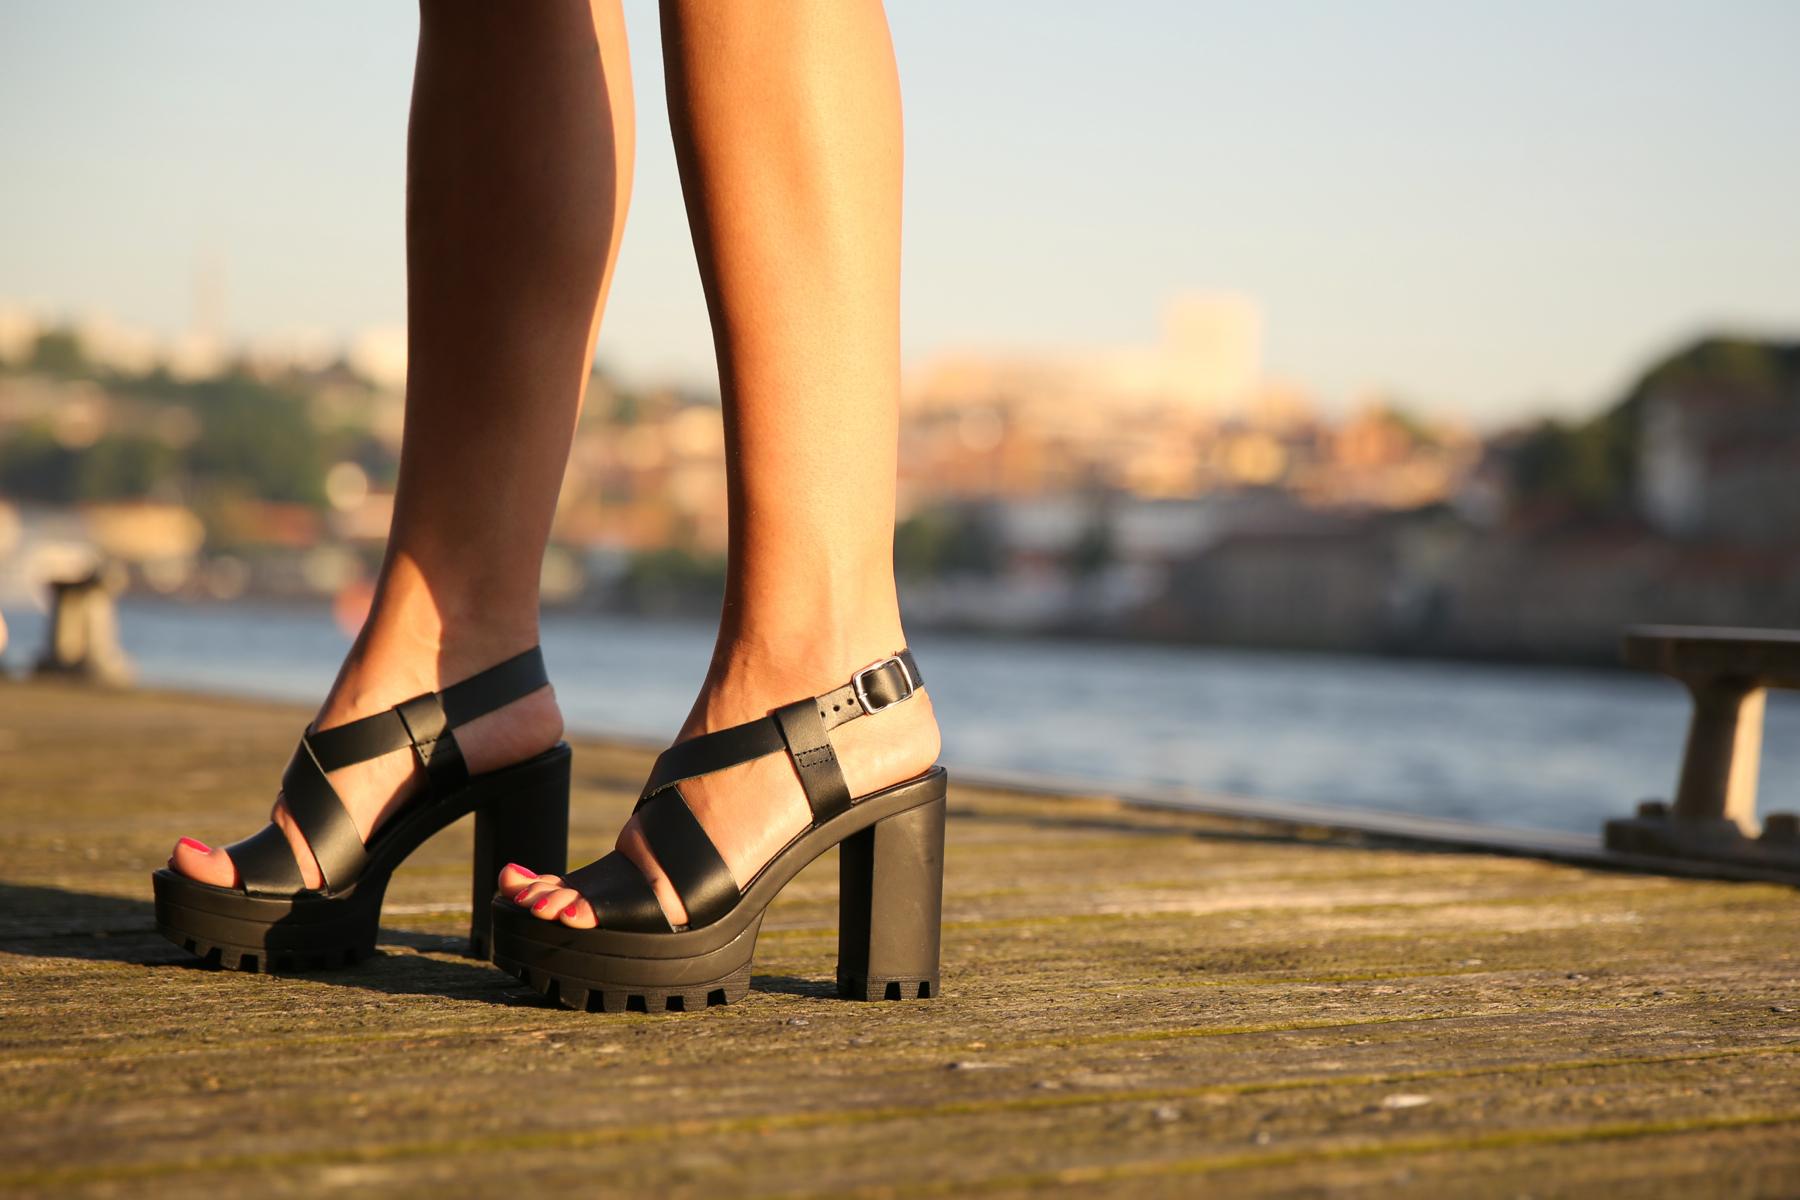 trendy_taste-look-outfit-street_style-ootd-blog-blogger-fashion_spain-moda_españa-salsa_jeans-dior_gafas-bolso_flecos-fringes_bag-khaki_shorts-shorts_caqui-grey_tee-camiseta_gris-verano-porto-portugal-4